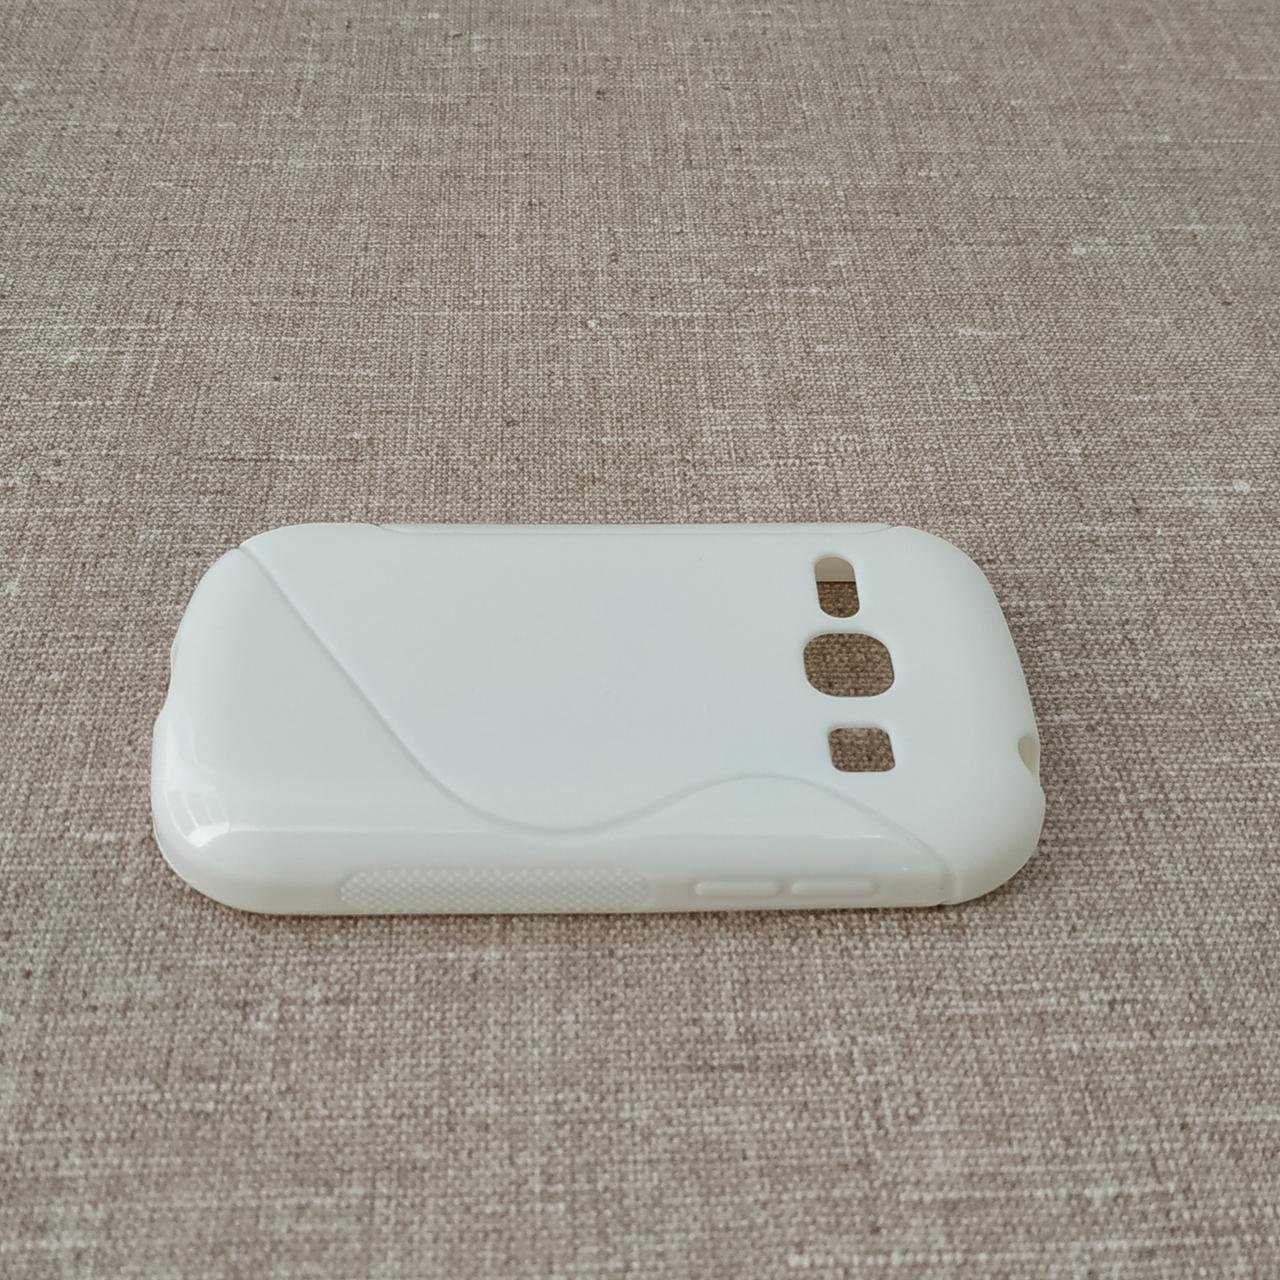 TPU Duotone Samsung Galaxy Fame white (S6810)